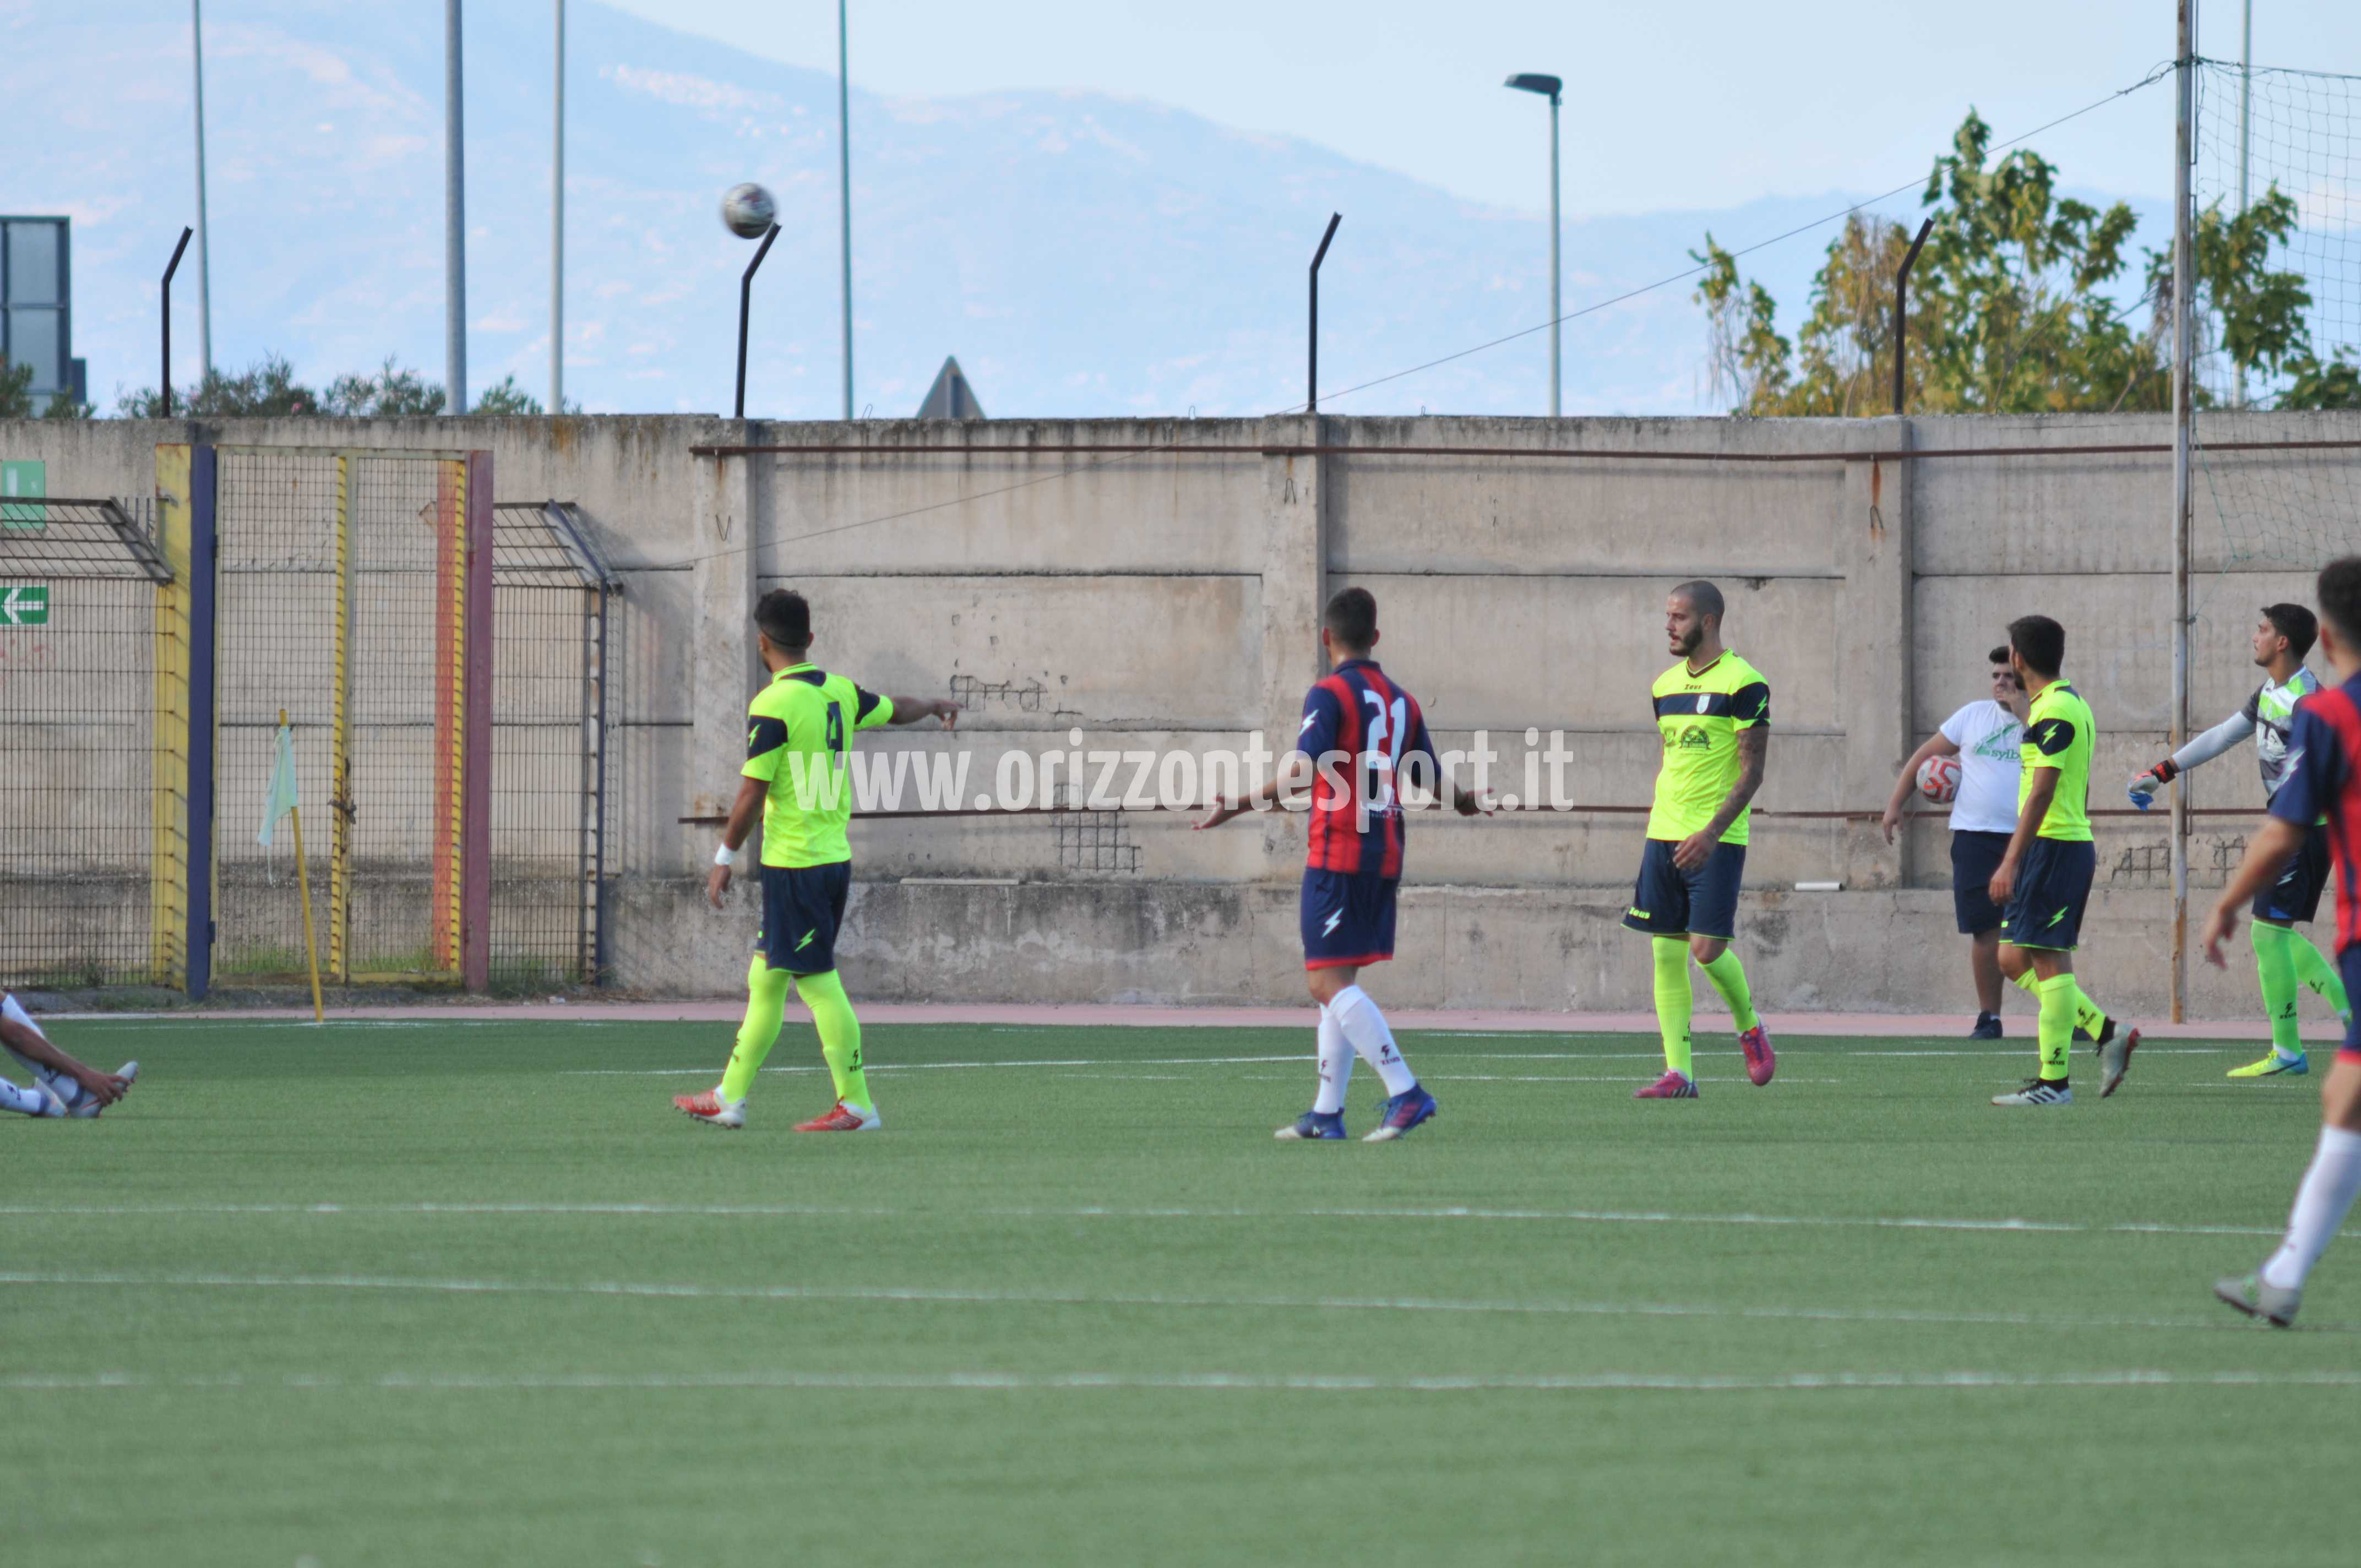 rossanese_praiatrtora_cpppa_italia (44)